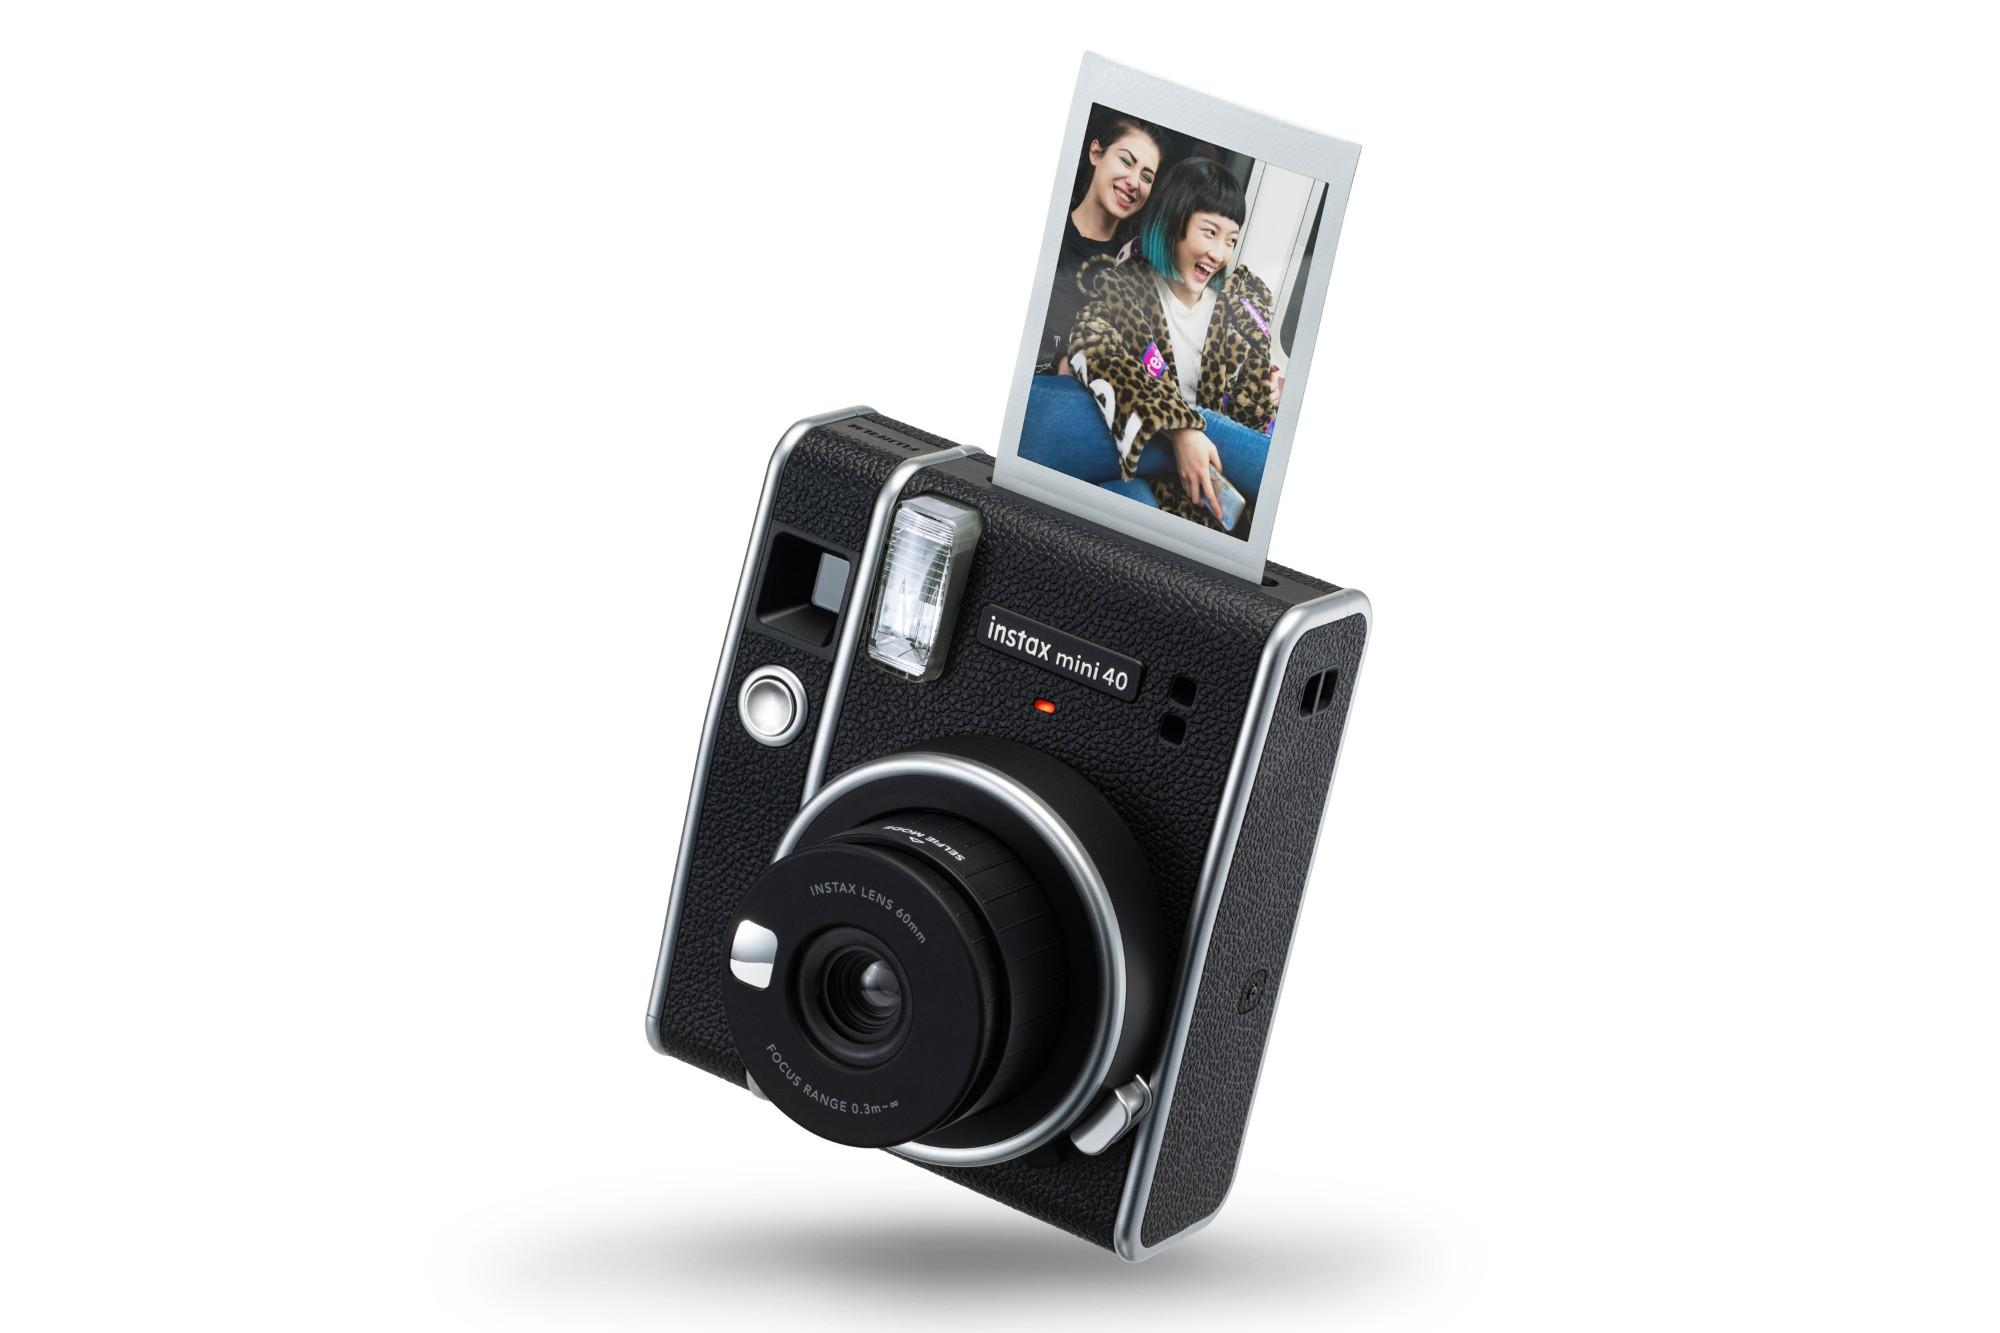 Fujifilm Instax Mini 40 Instant Camera (10 Shots) - Black